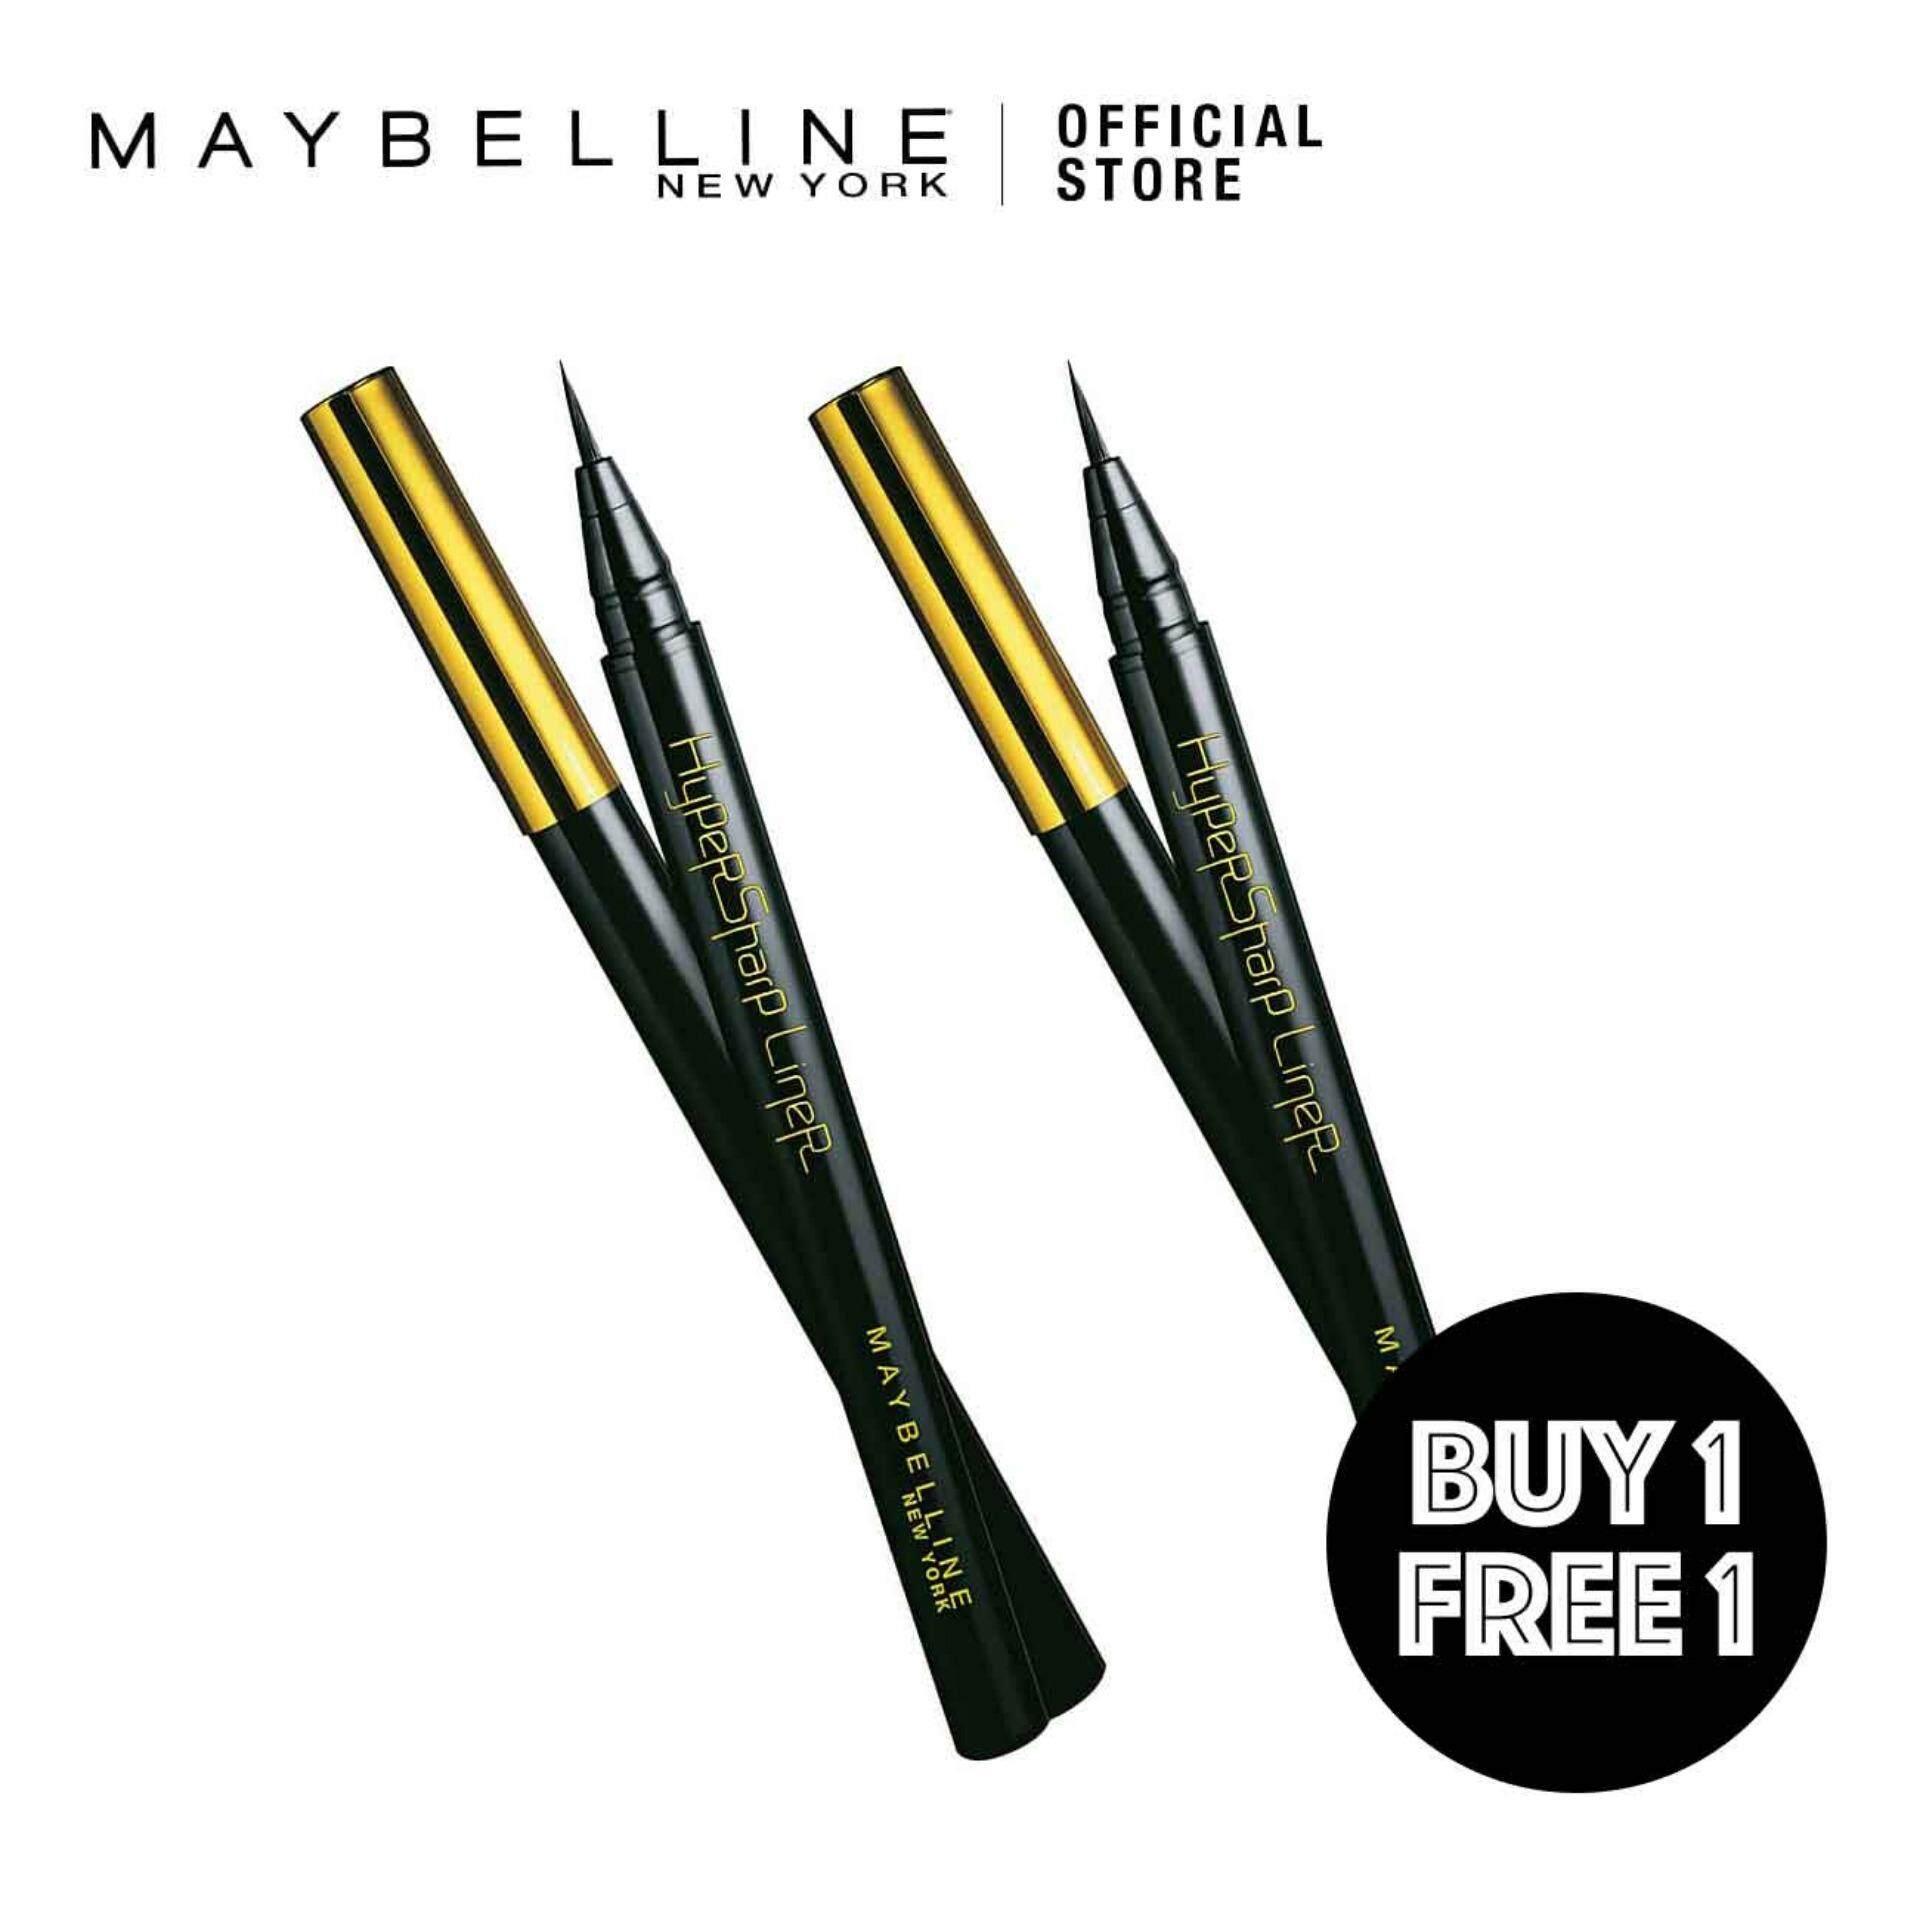 Maybelline Eye Makeup Price In Malaysia Best Hyper Ink Liner Black B1f1 Hypersharp Laser Eyeliner